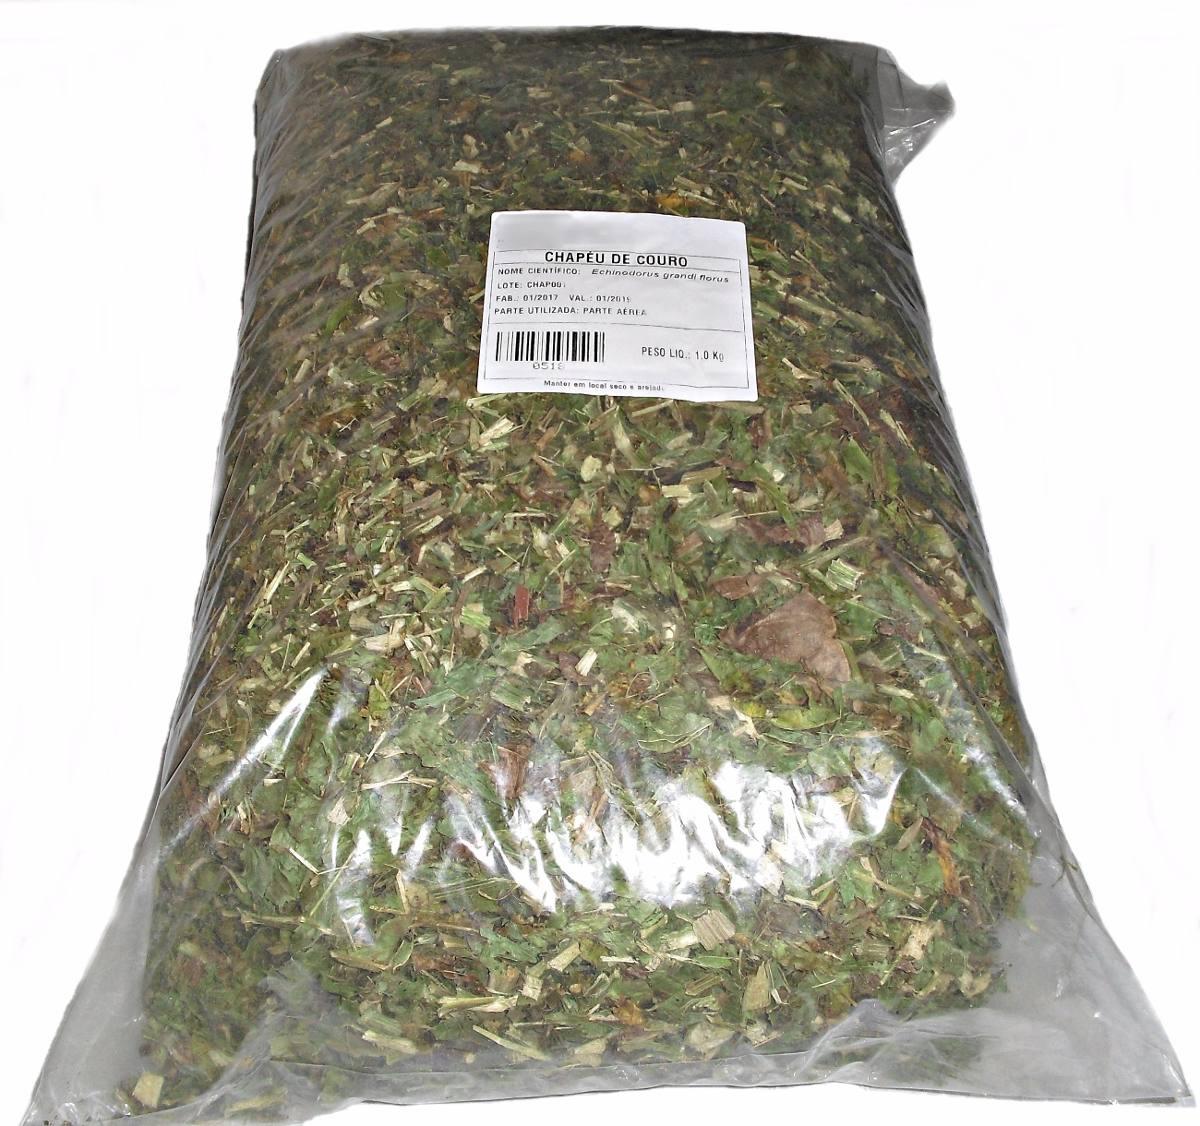 chapeu de couro chá 1kg ( echinodorus glandiflorus ). Carregando zoom. 6ea41639cdd